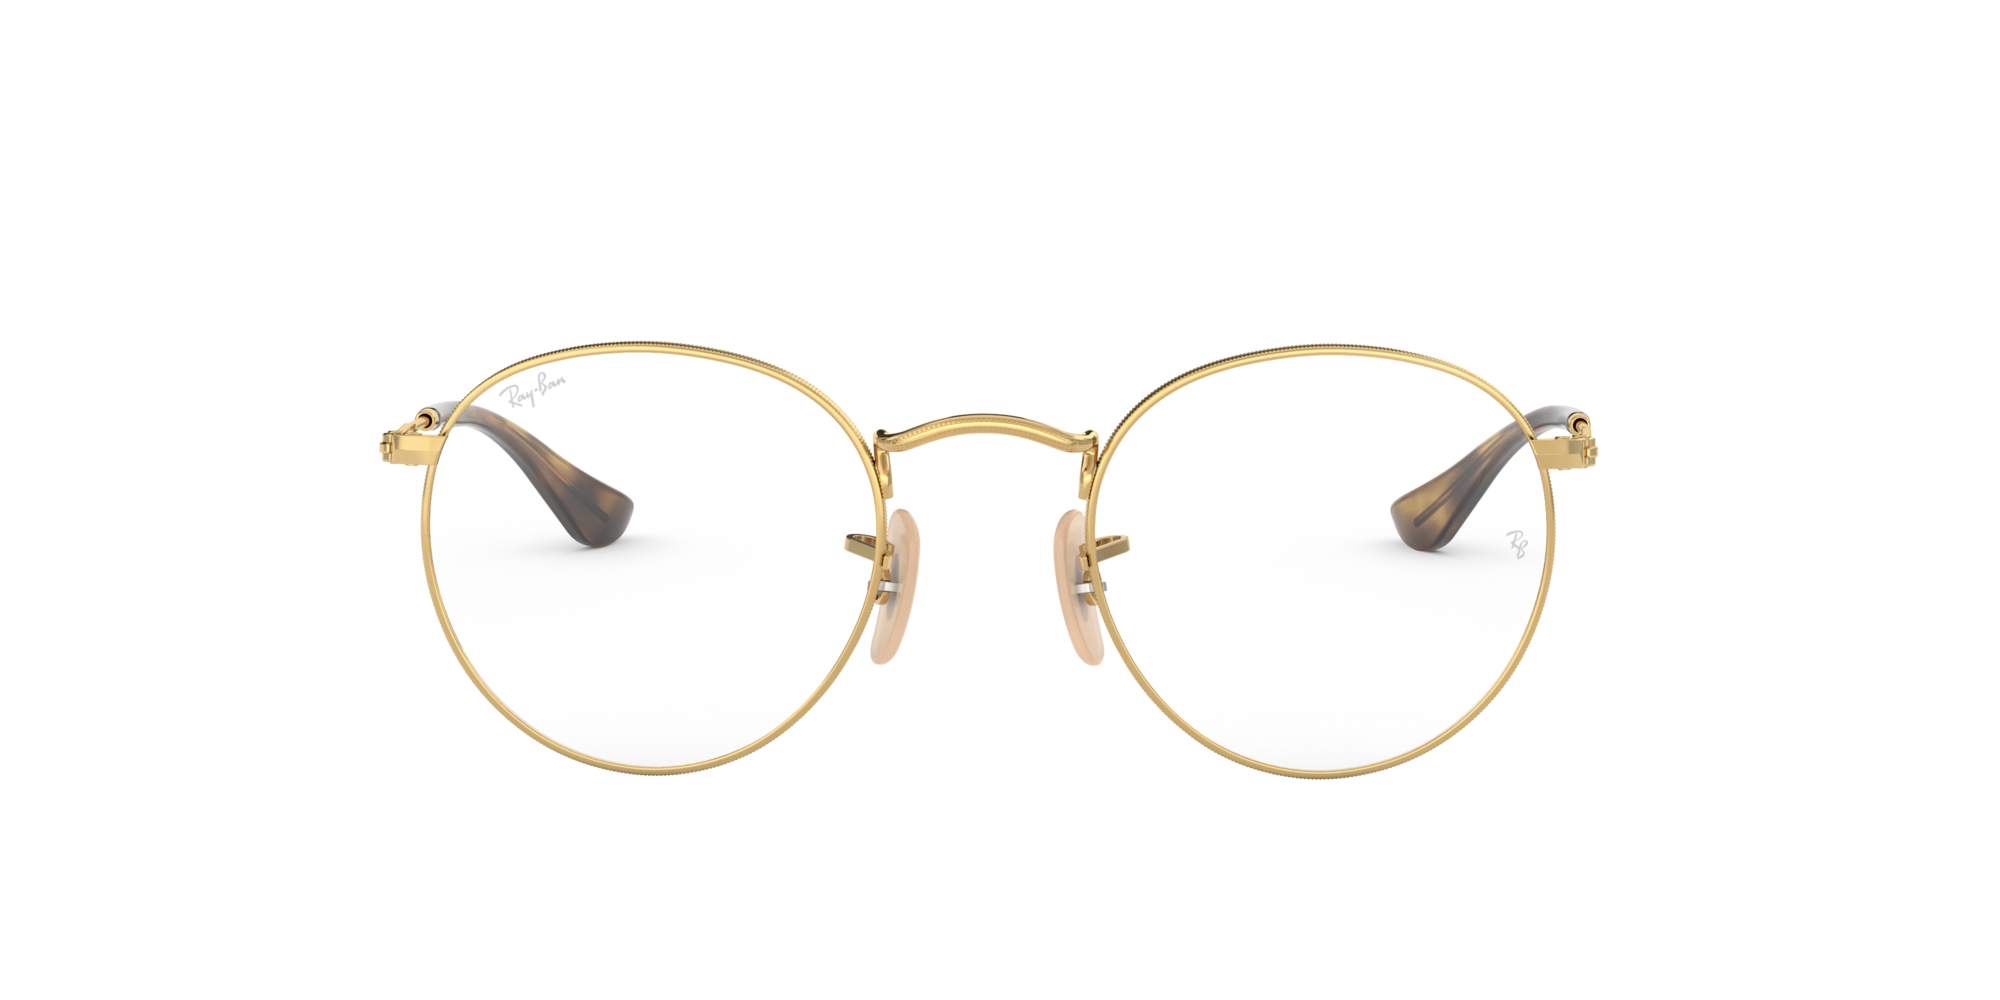 Image de RX3447V ROUND METAL from LensCrafters | Lunettes, lunettes d'ordonnance en ligne, lunetterie